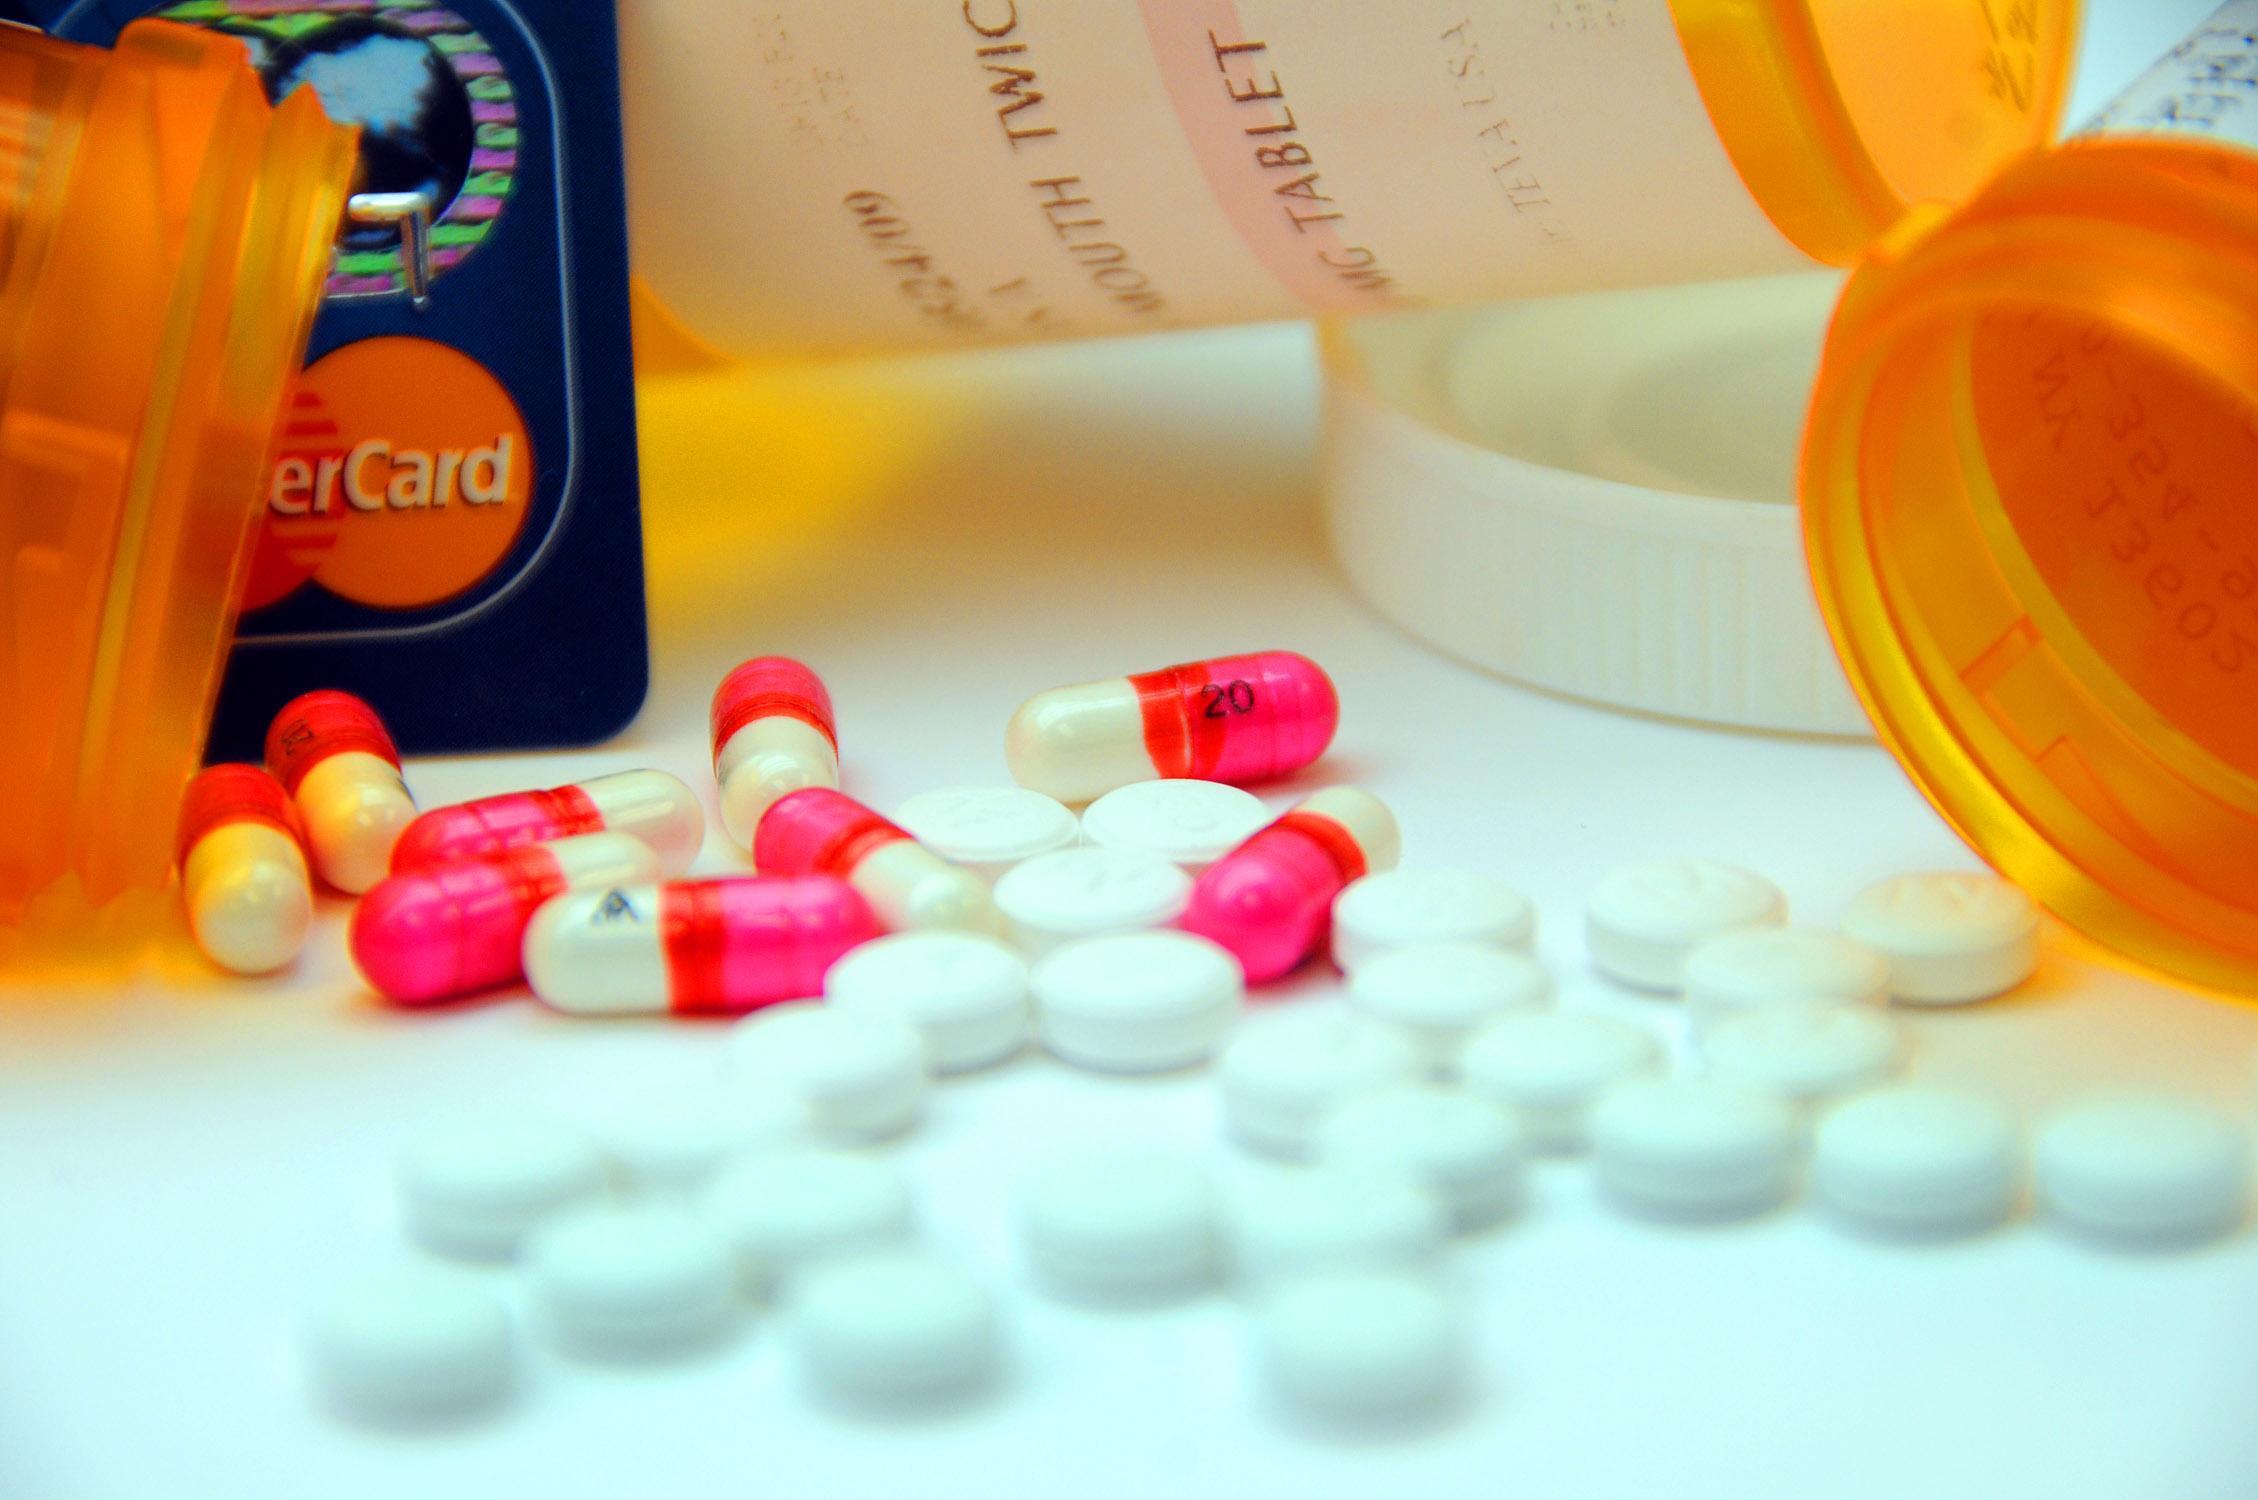 Canada Pharmacy Online